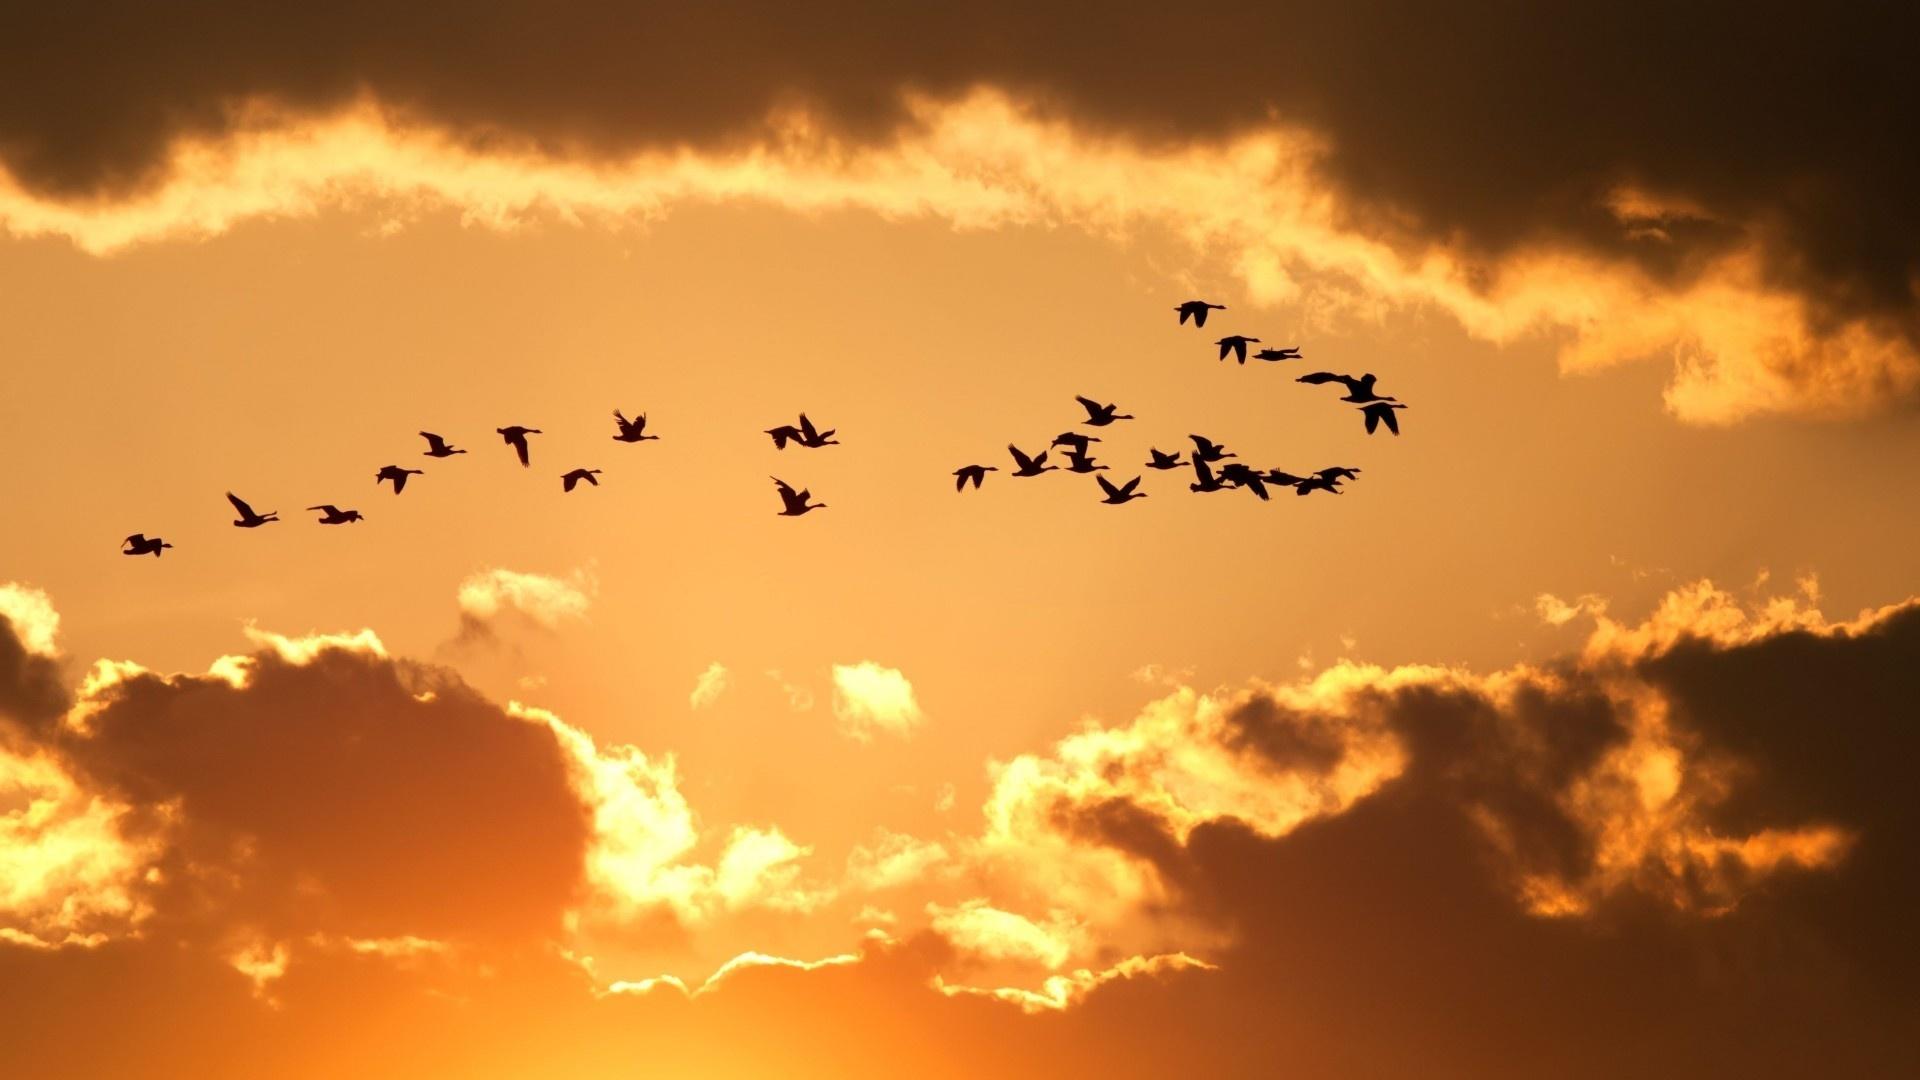 Wedge Birds In The Sky Wallpaper theme